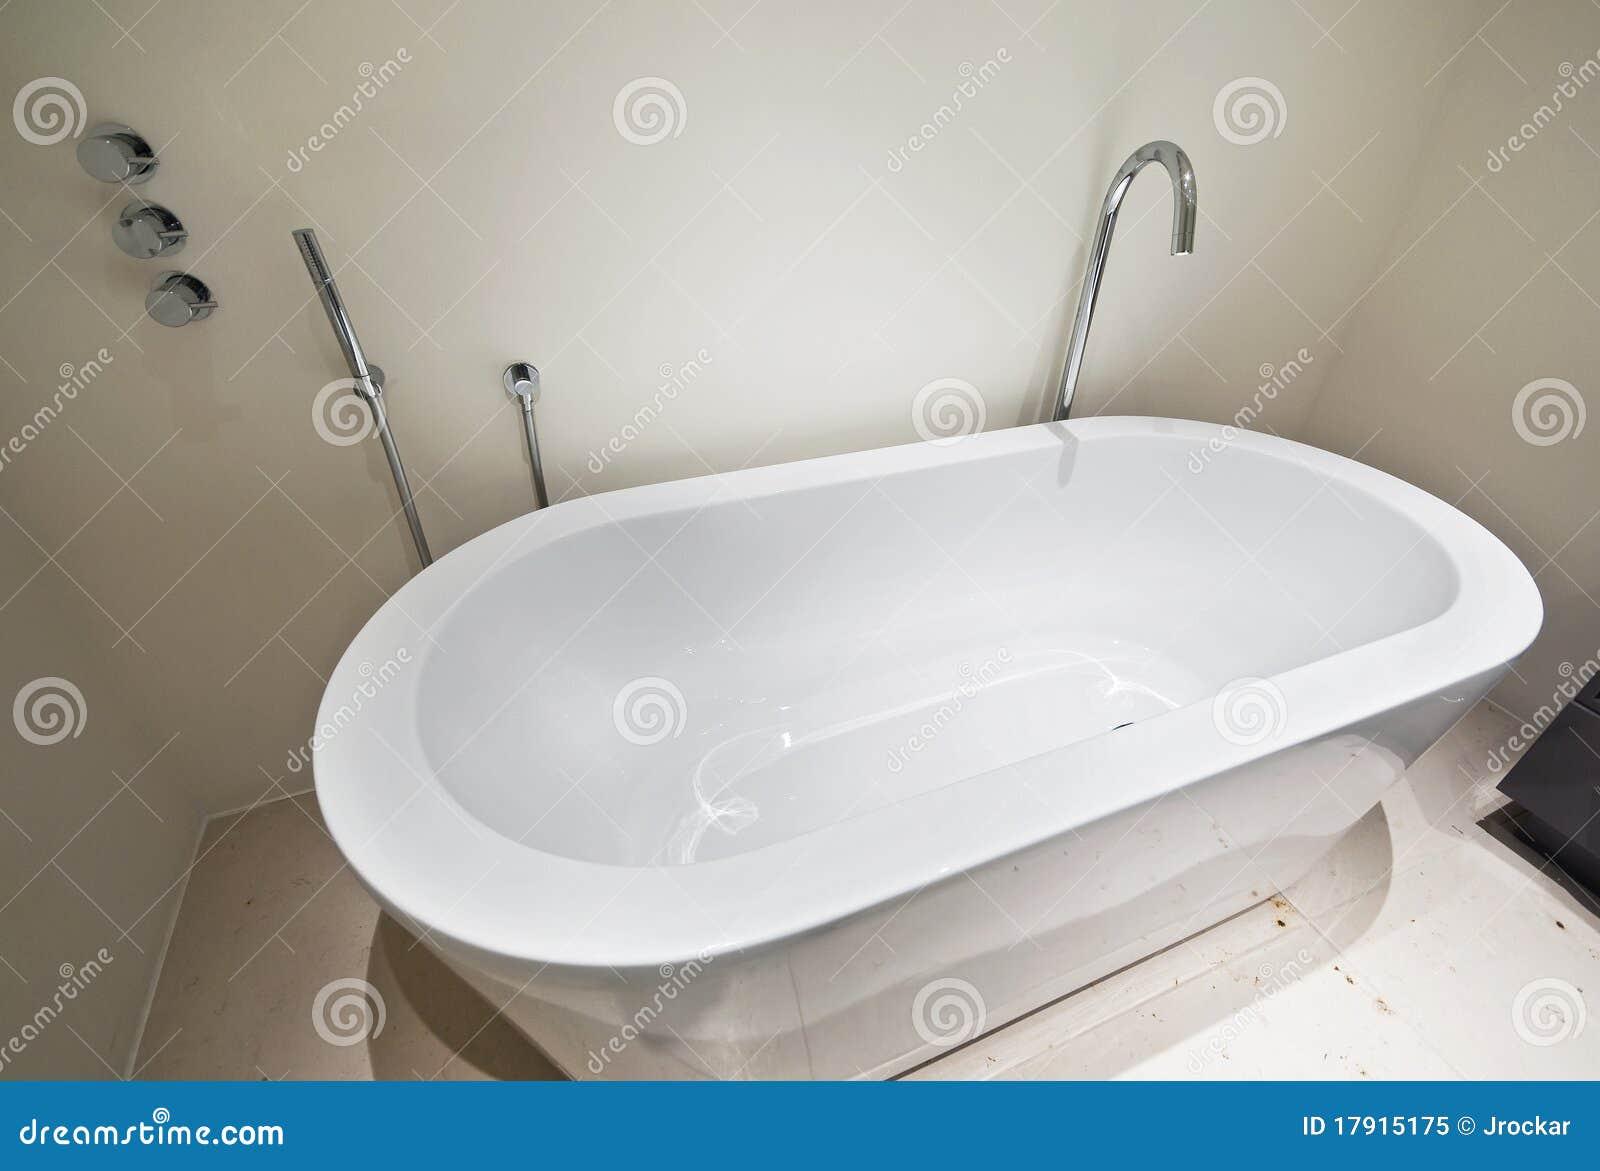 Designer bath tub royalty free stock photo image 17915175 - Designer bath tub ...